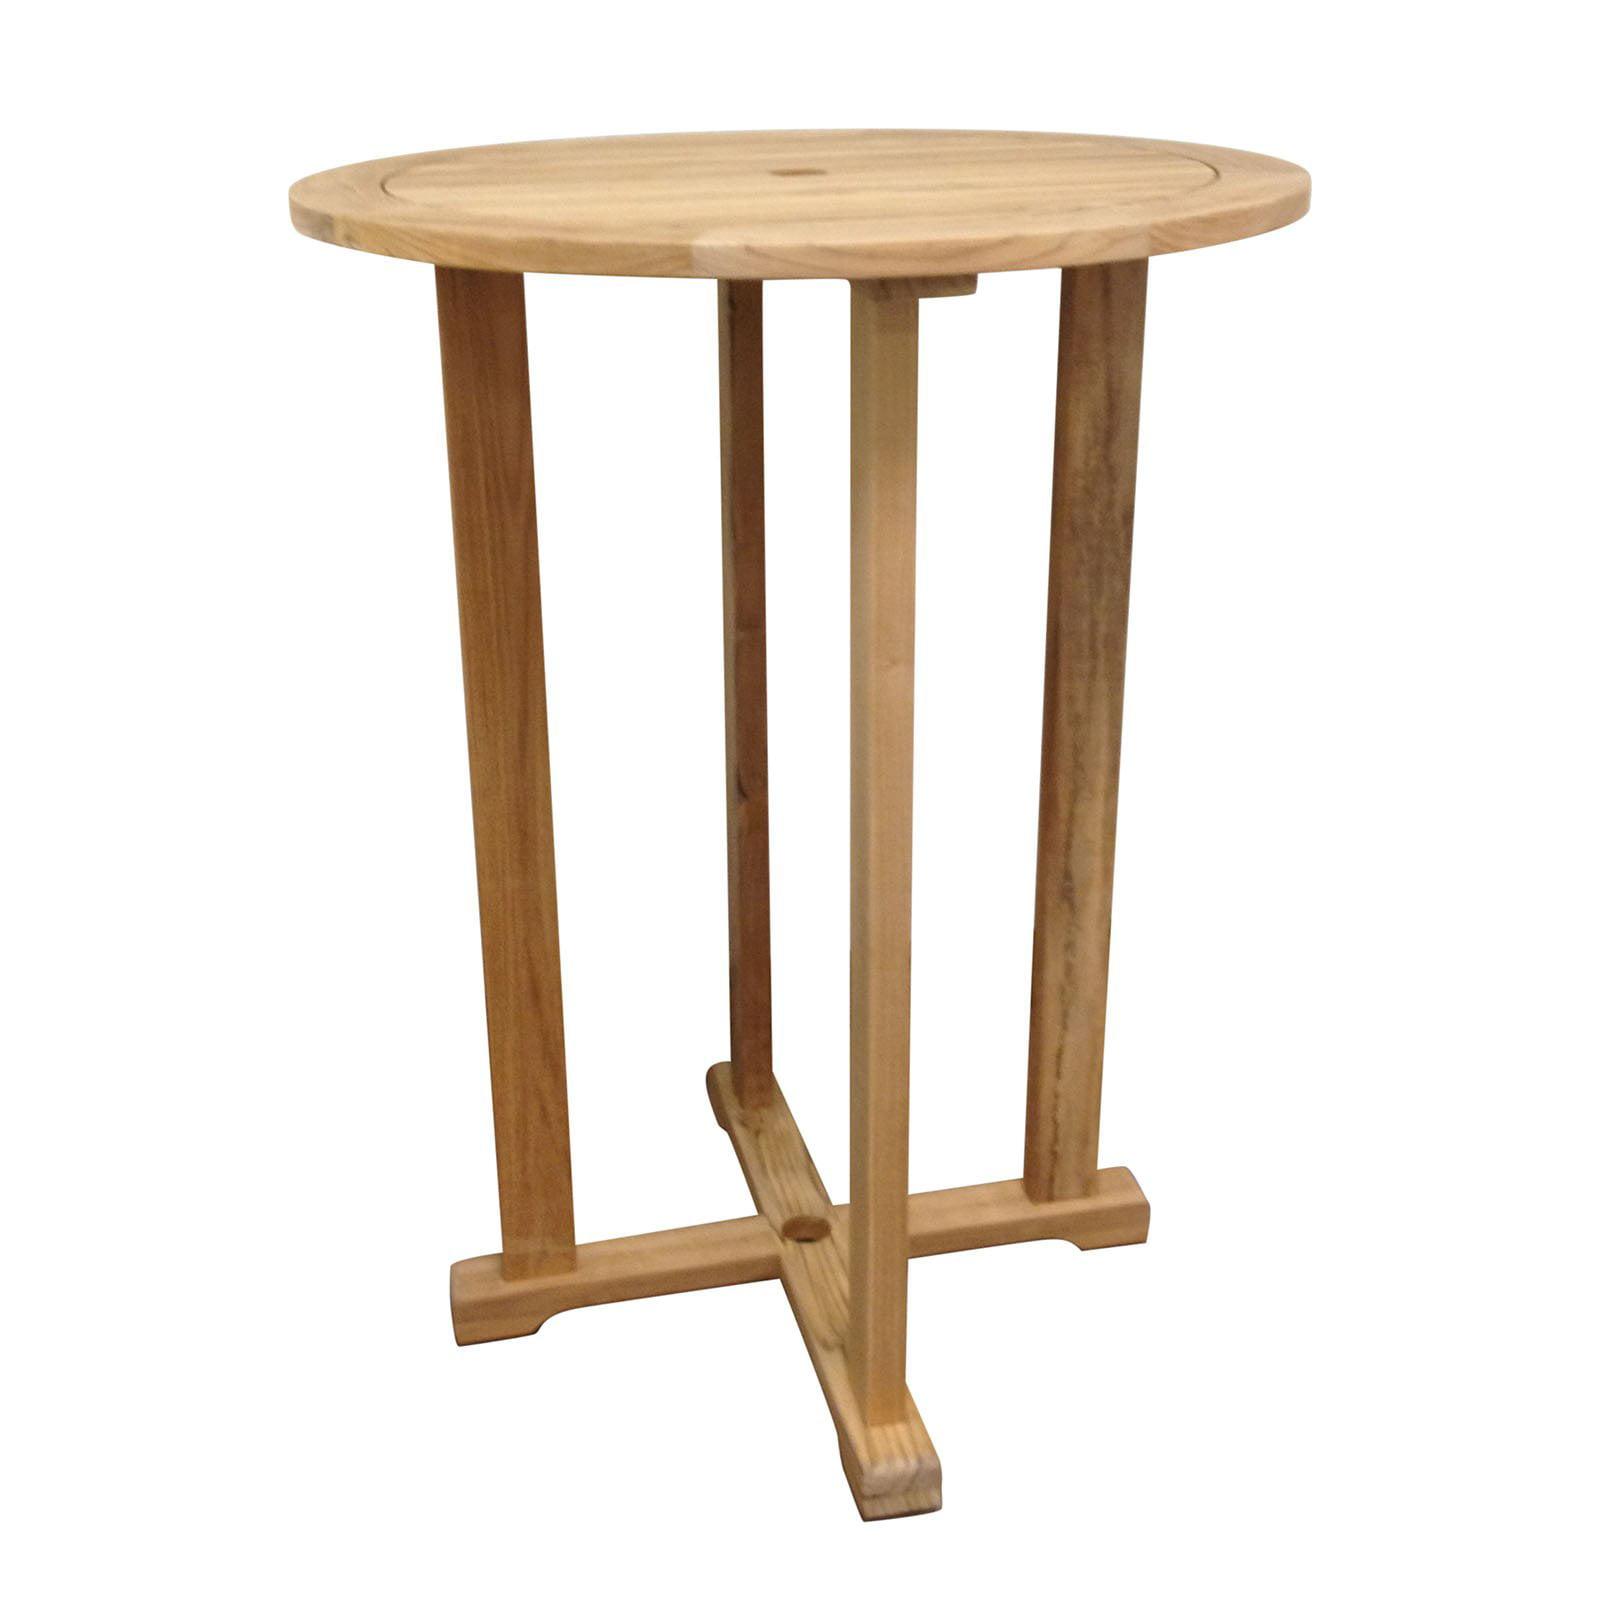 HiTeak Furniture R Bar Height Patio Dining Table